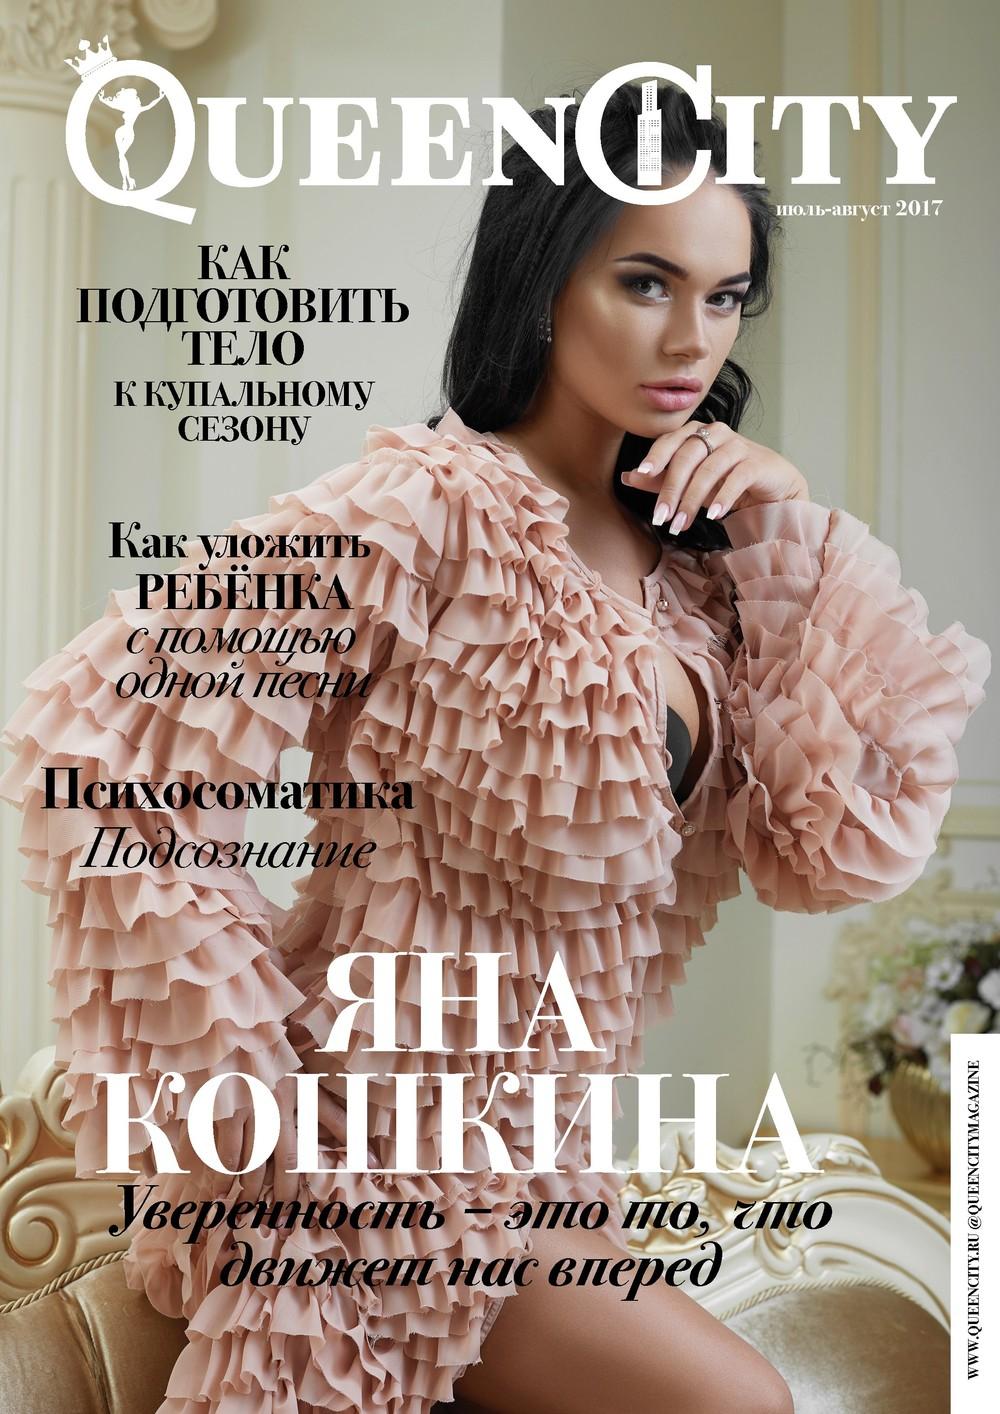 Журнал ИЮЛЬ-АВГУСТ 2017